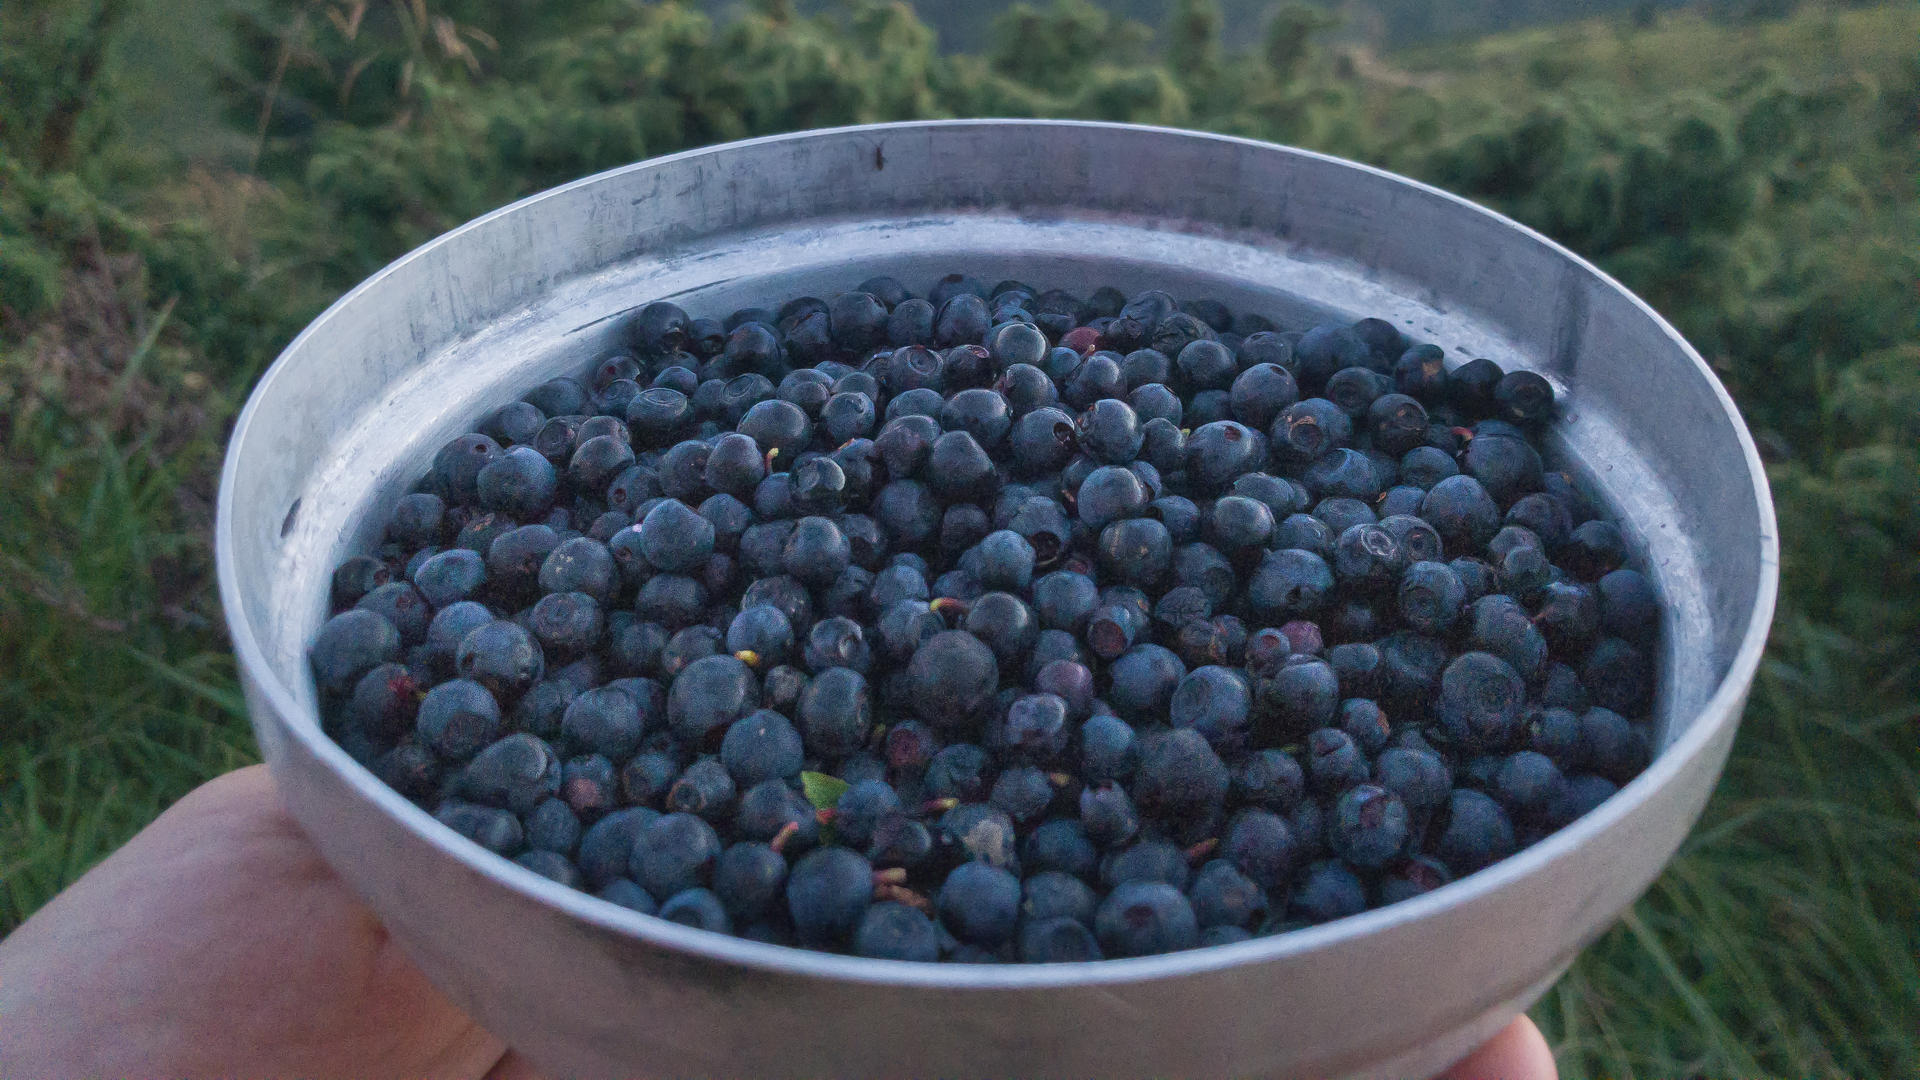 blueberries, bluebbery carpathians, blueberries svidovec